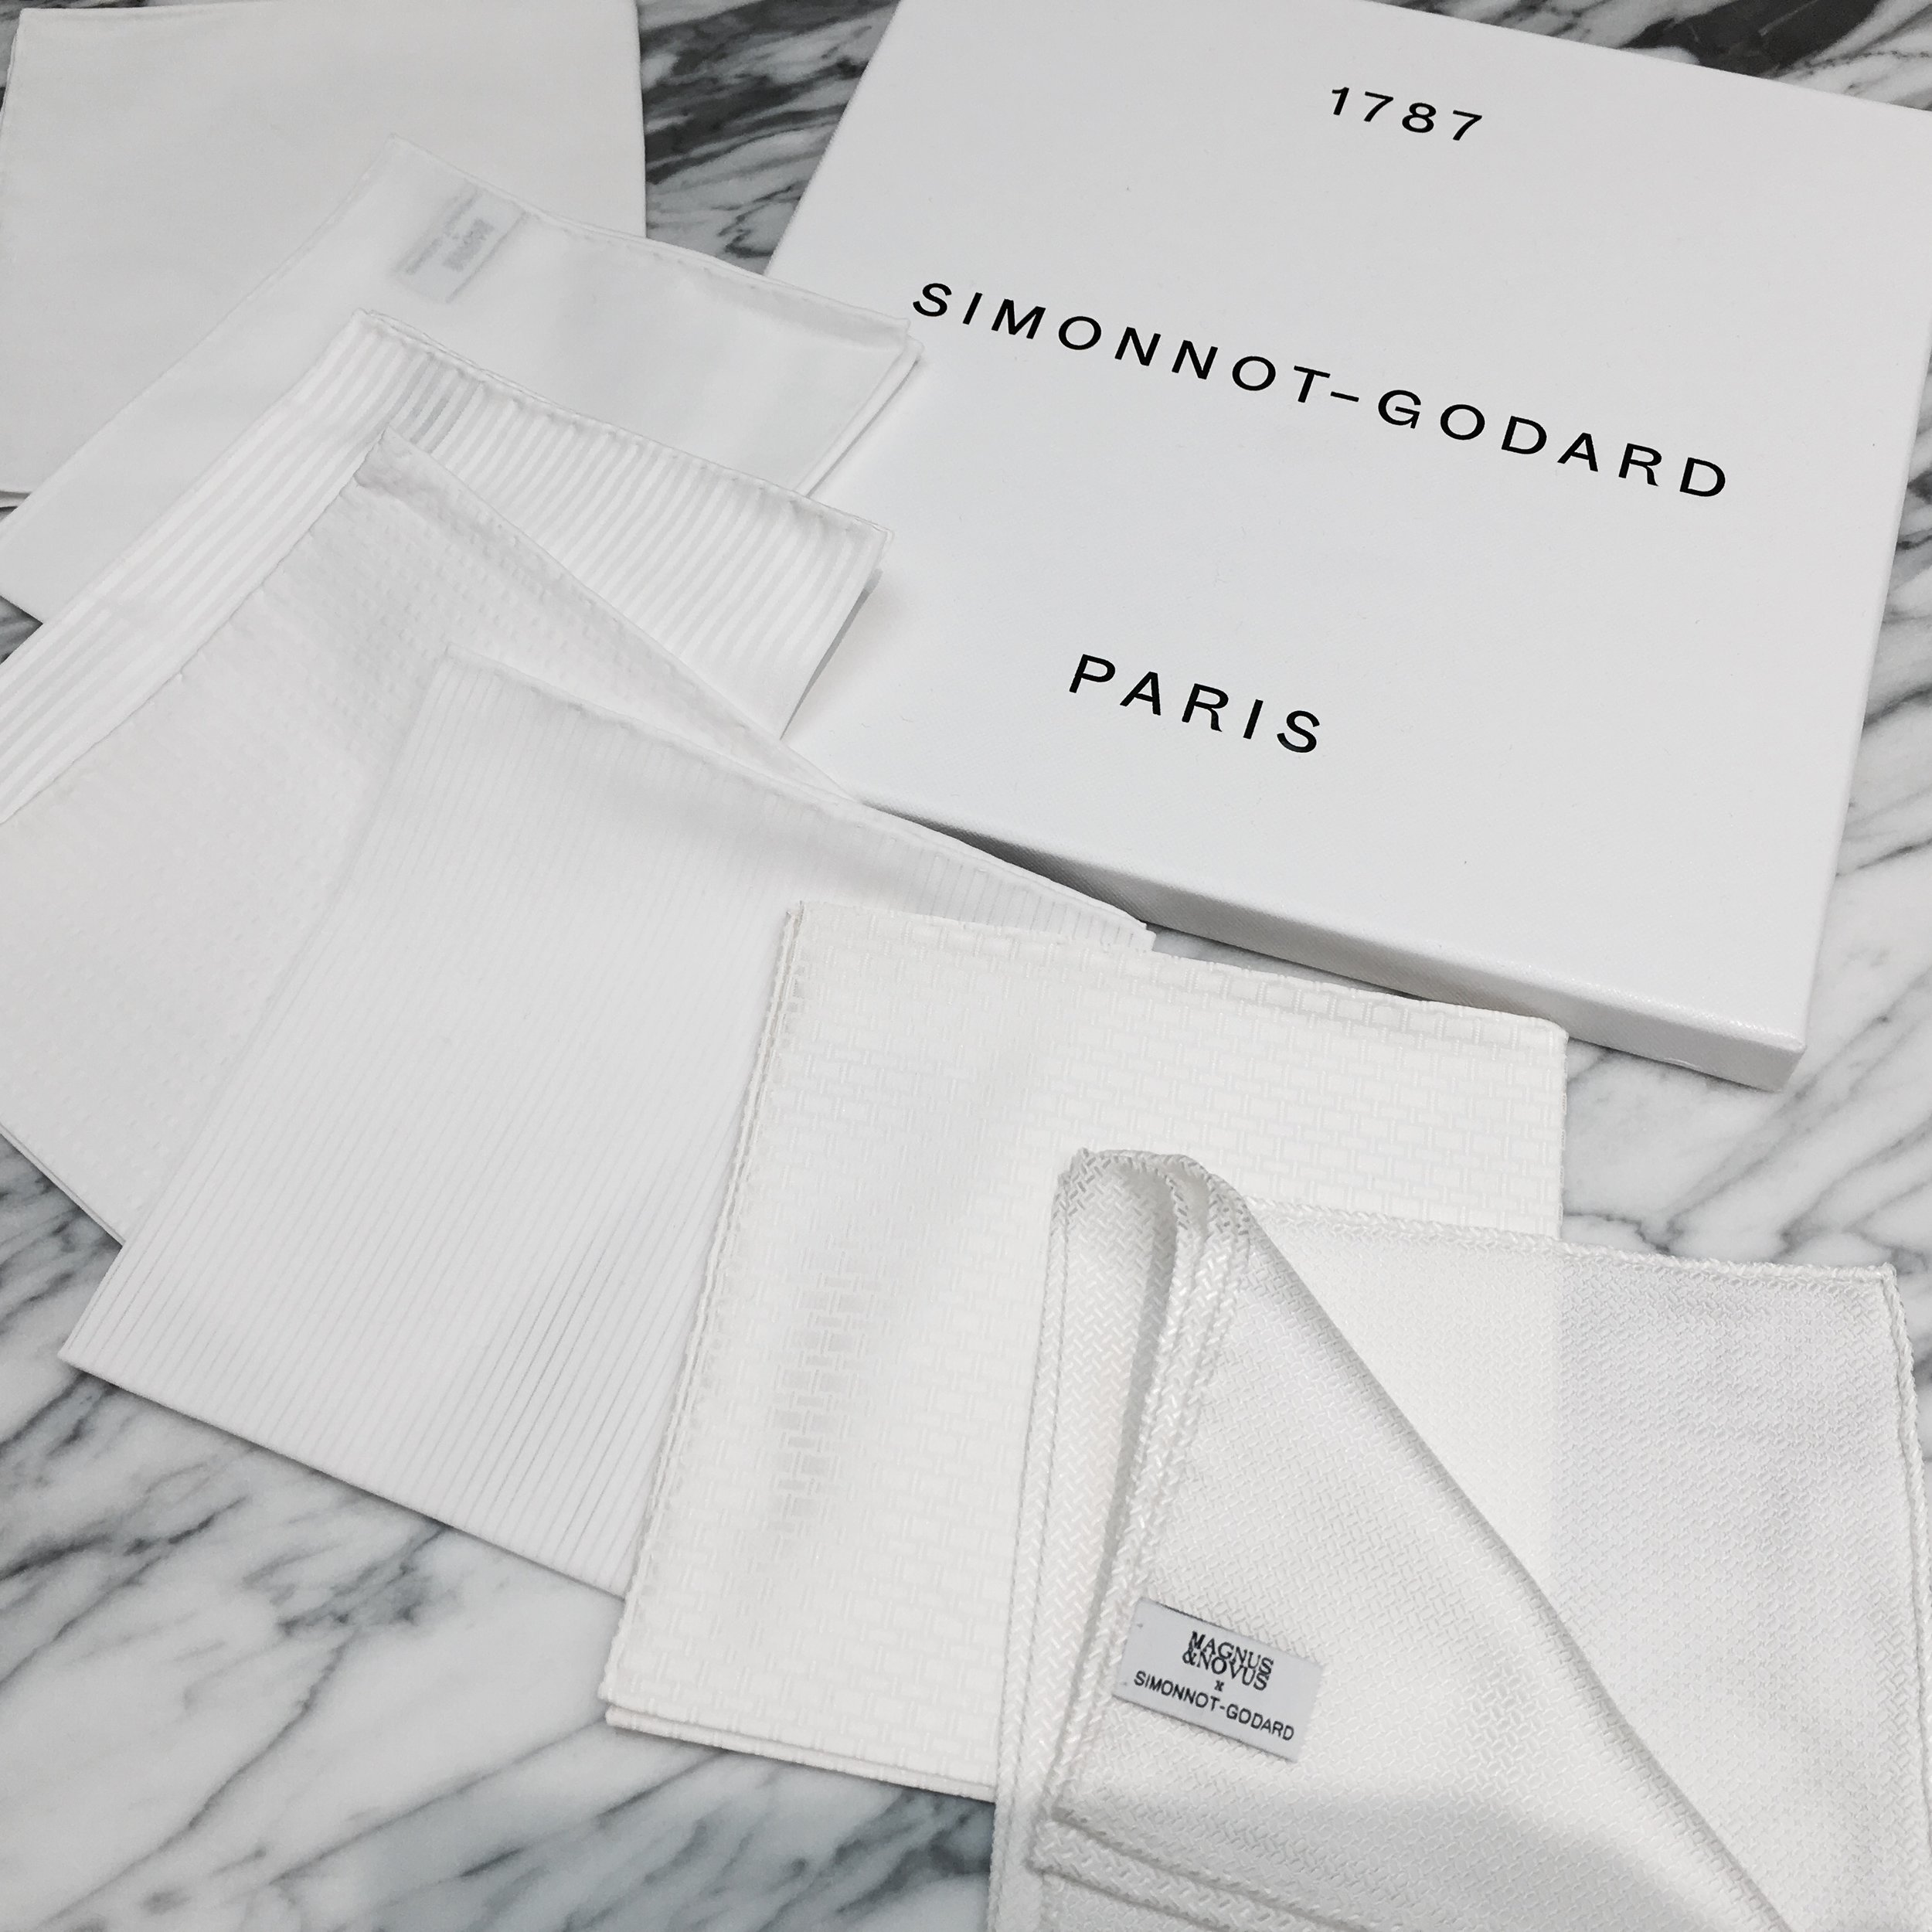 Magnus-&-Novus-x-Simonnot-Godard-Collaboration-Hand-Made-Pocket-Square